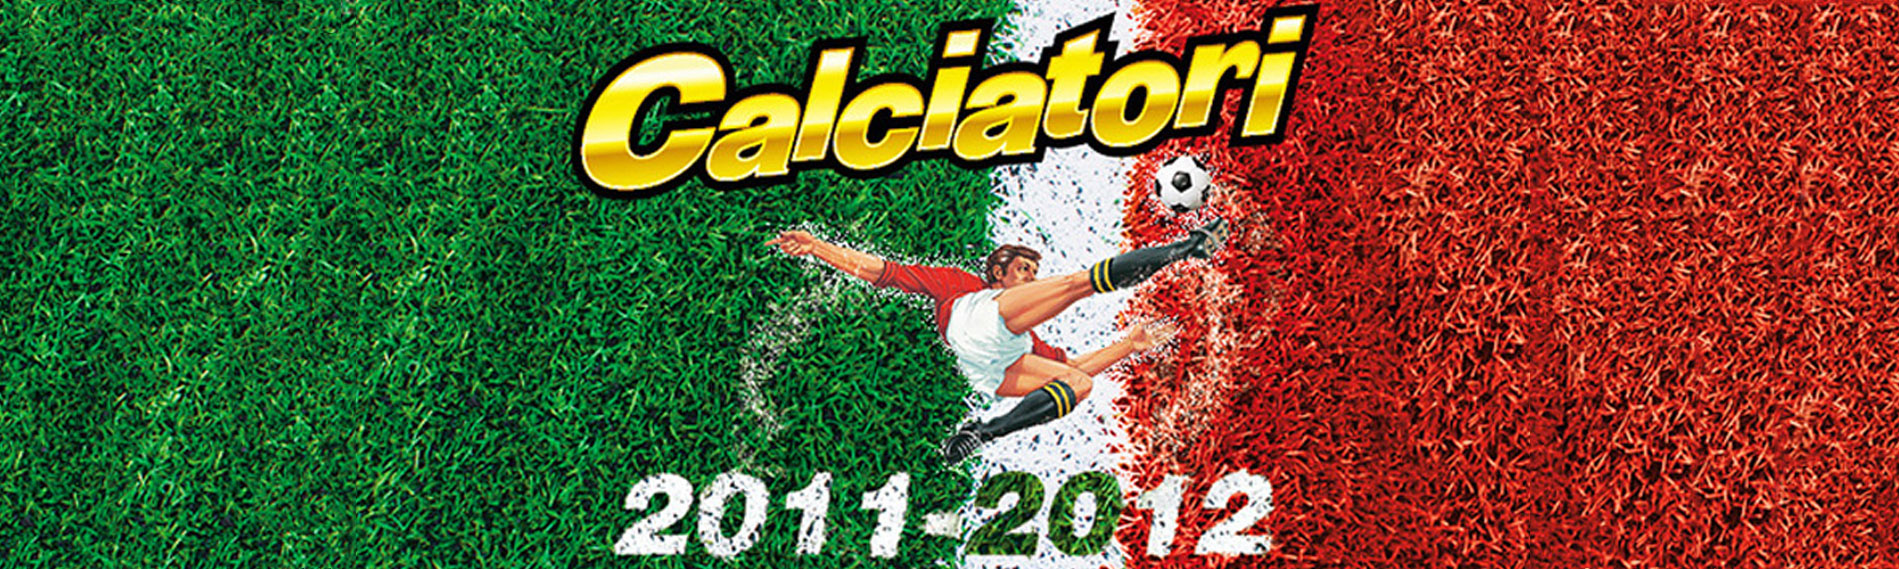 Panini lanzó el álbum Calciatori 2011-12 en Italia